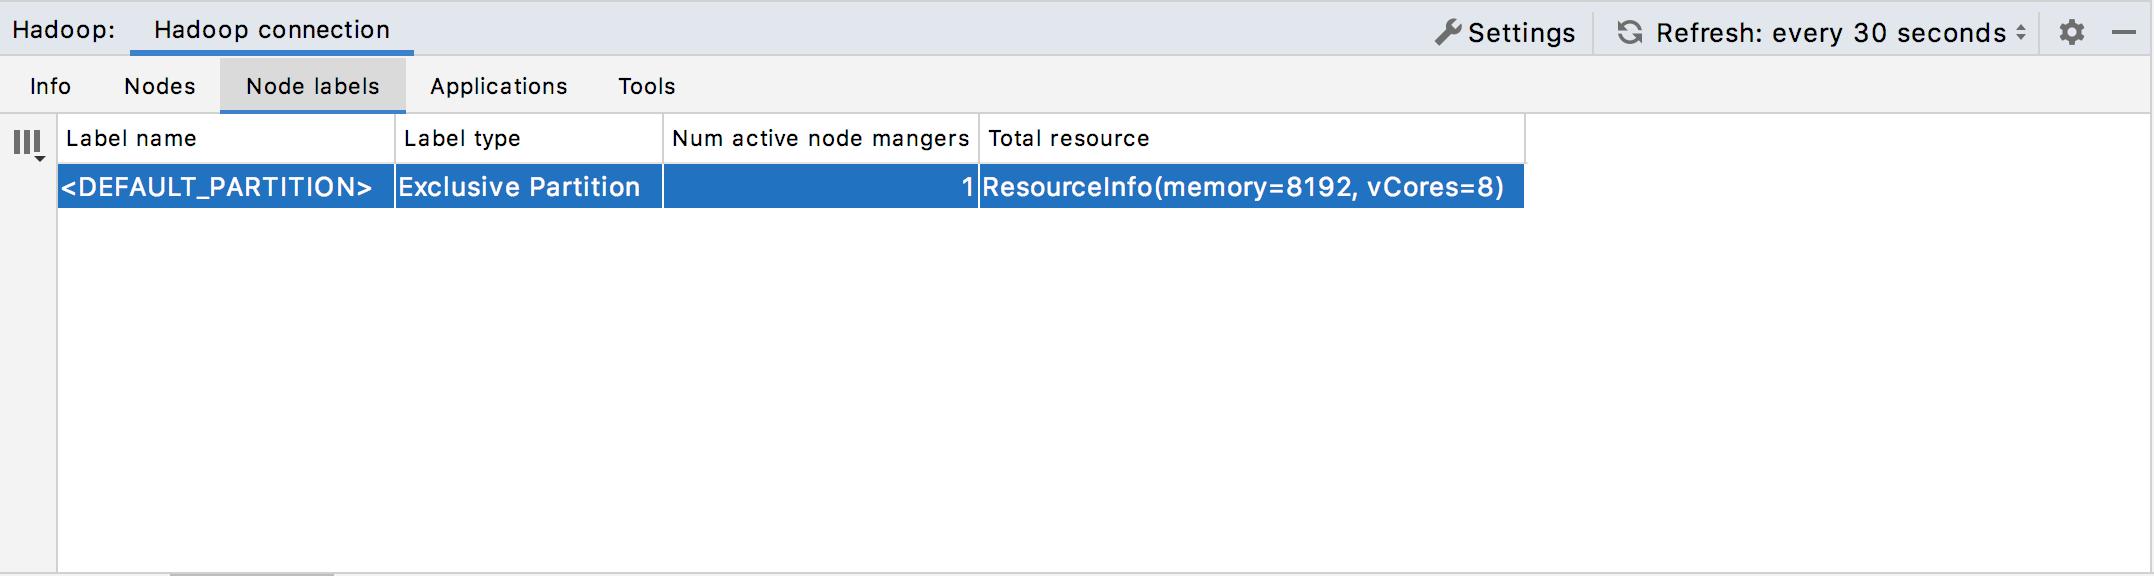 Hadoop monitoring: Node labels